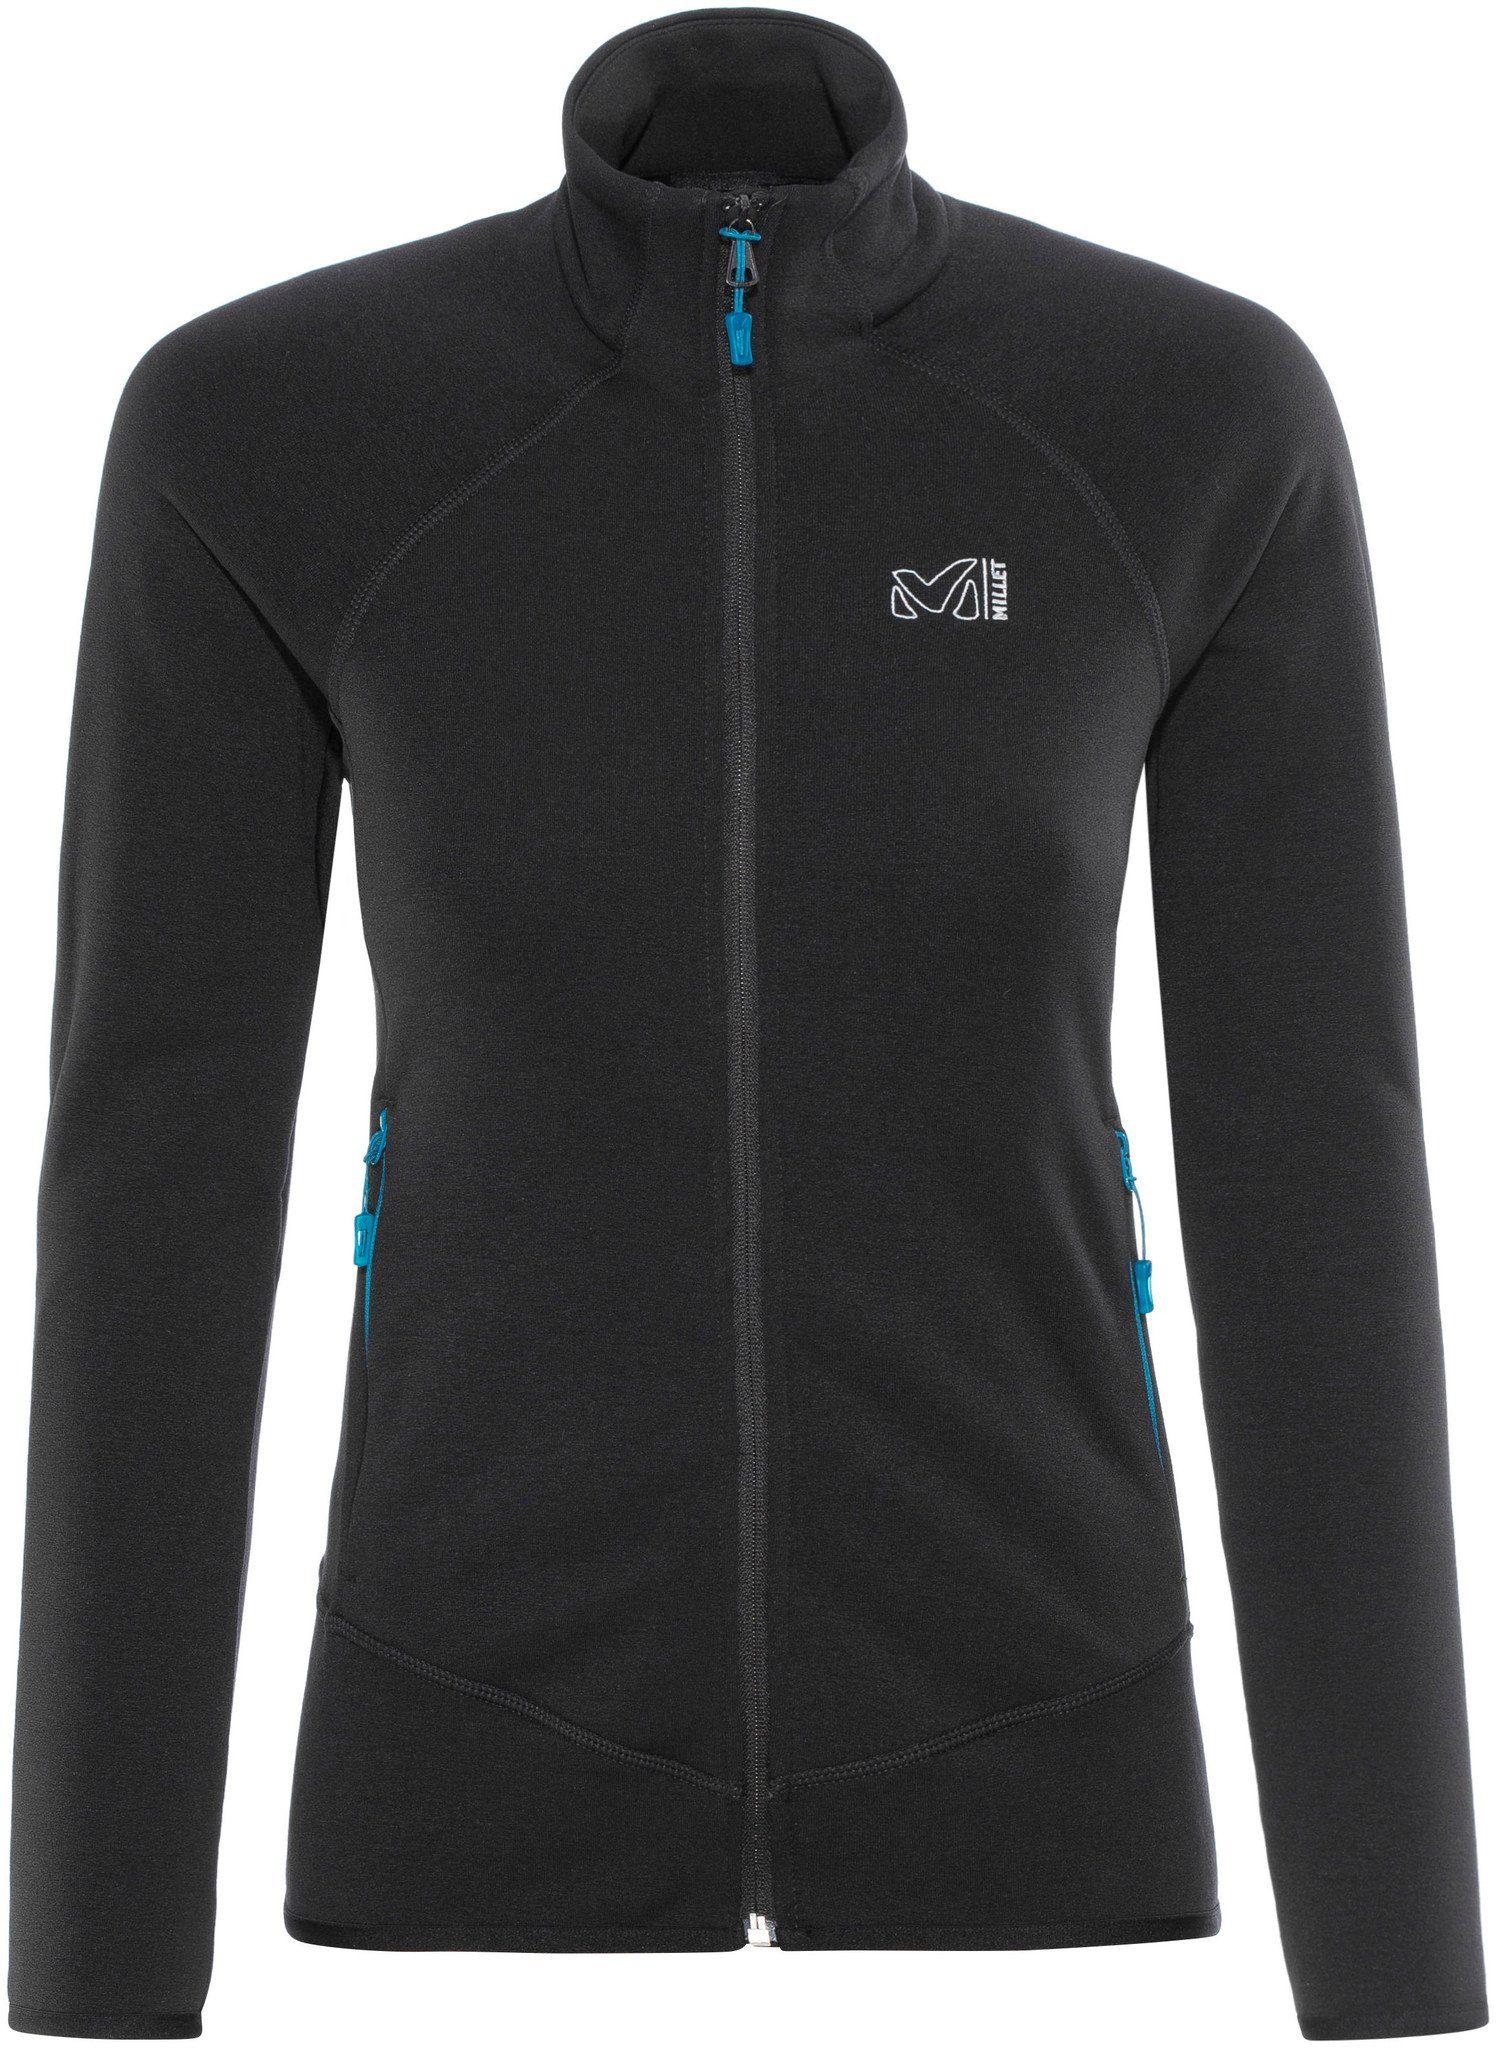 Millet Outdoorjacke LD Charmoz Power Jacket Women online kaufen ZYsjQ2